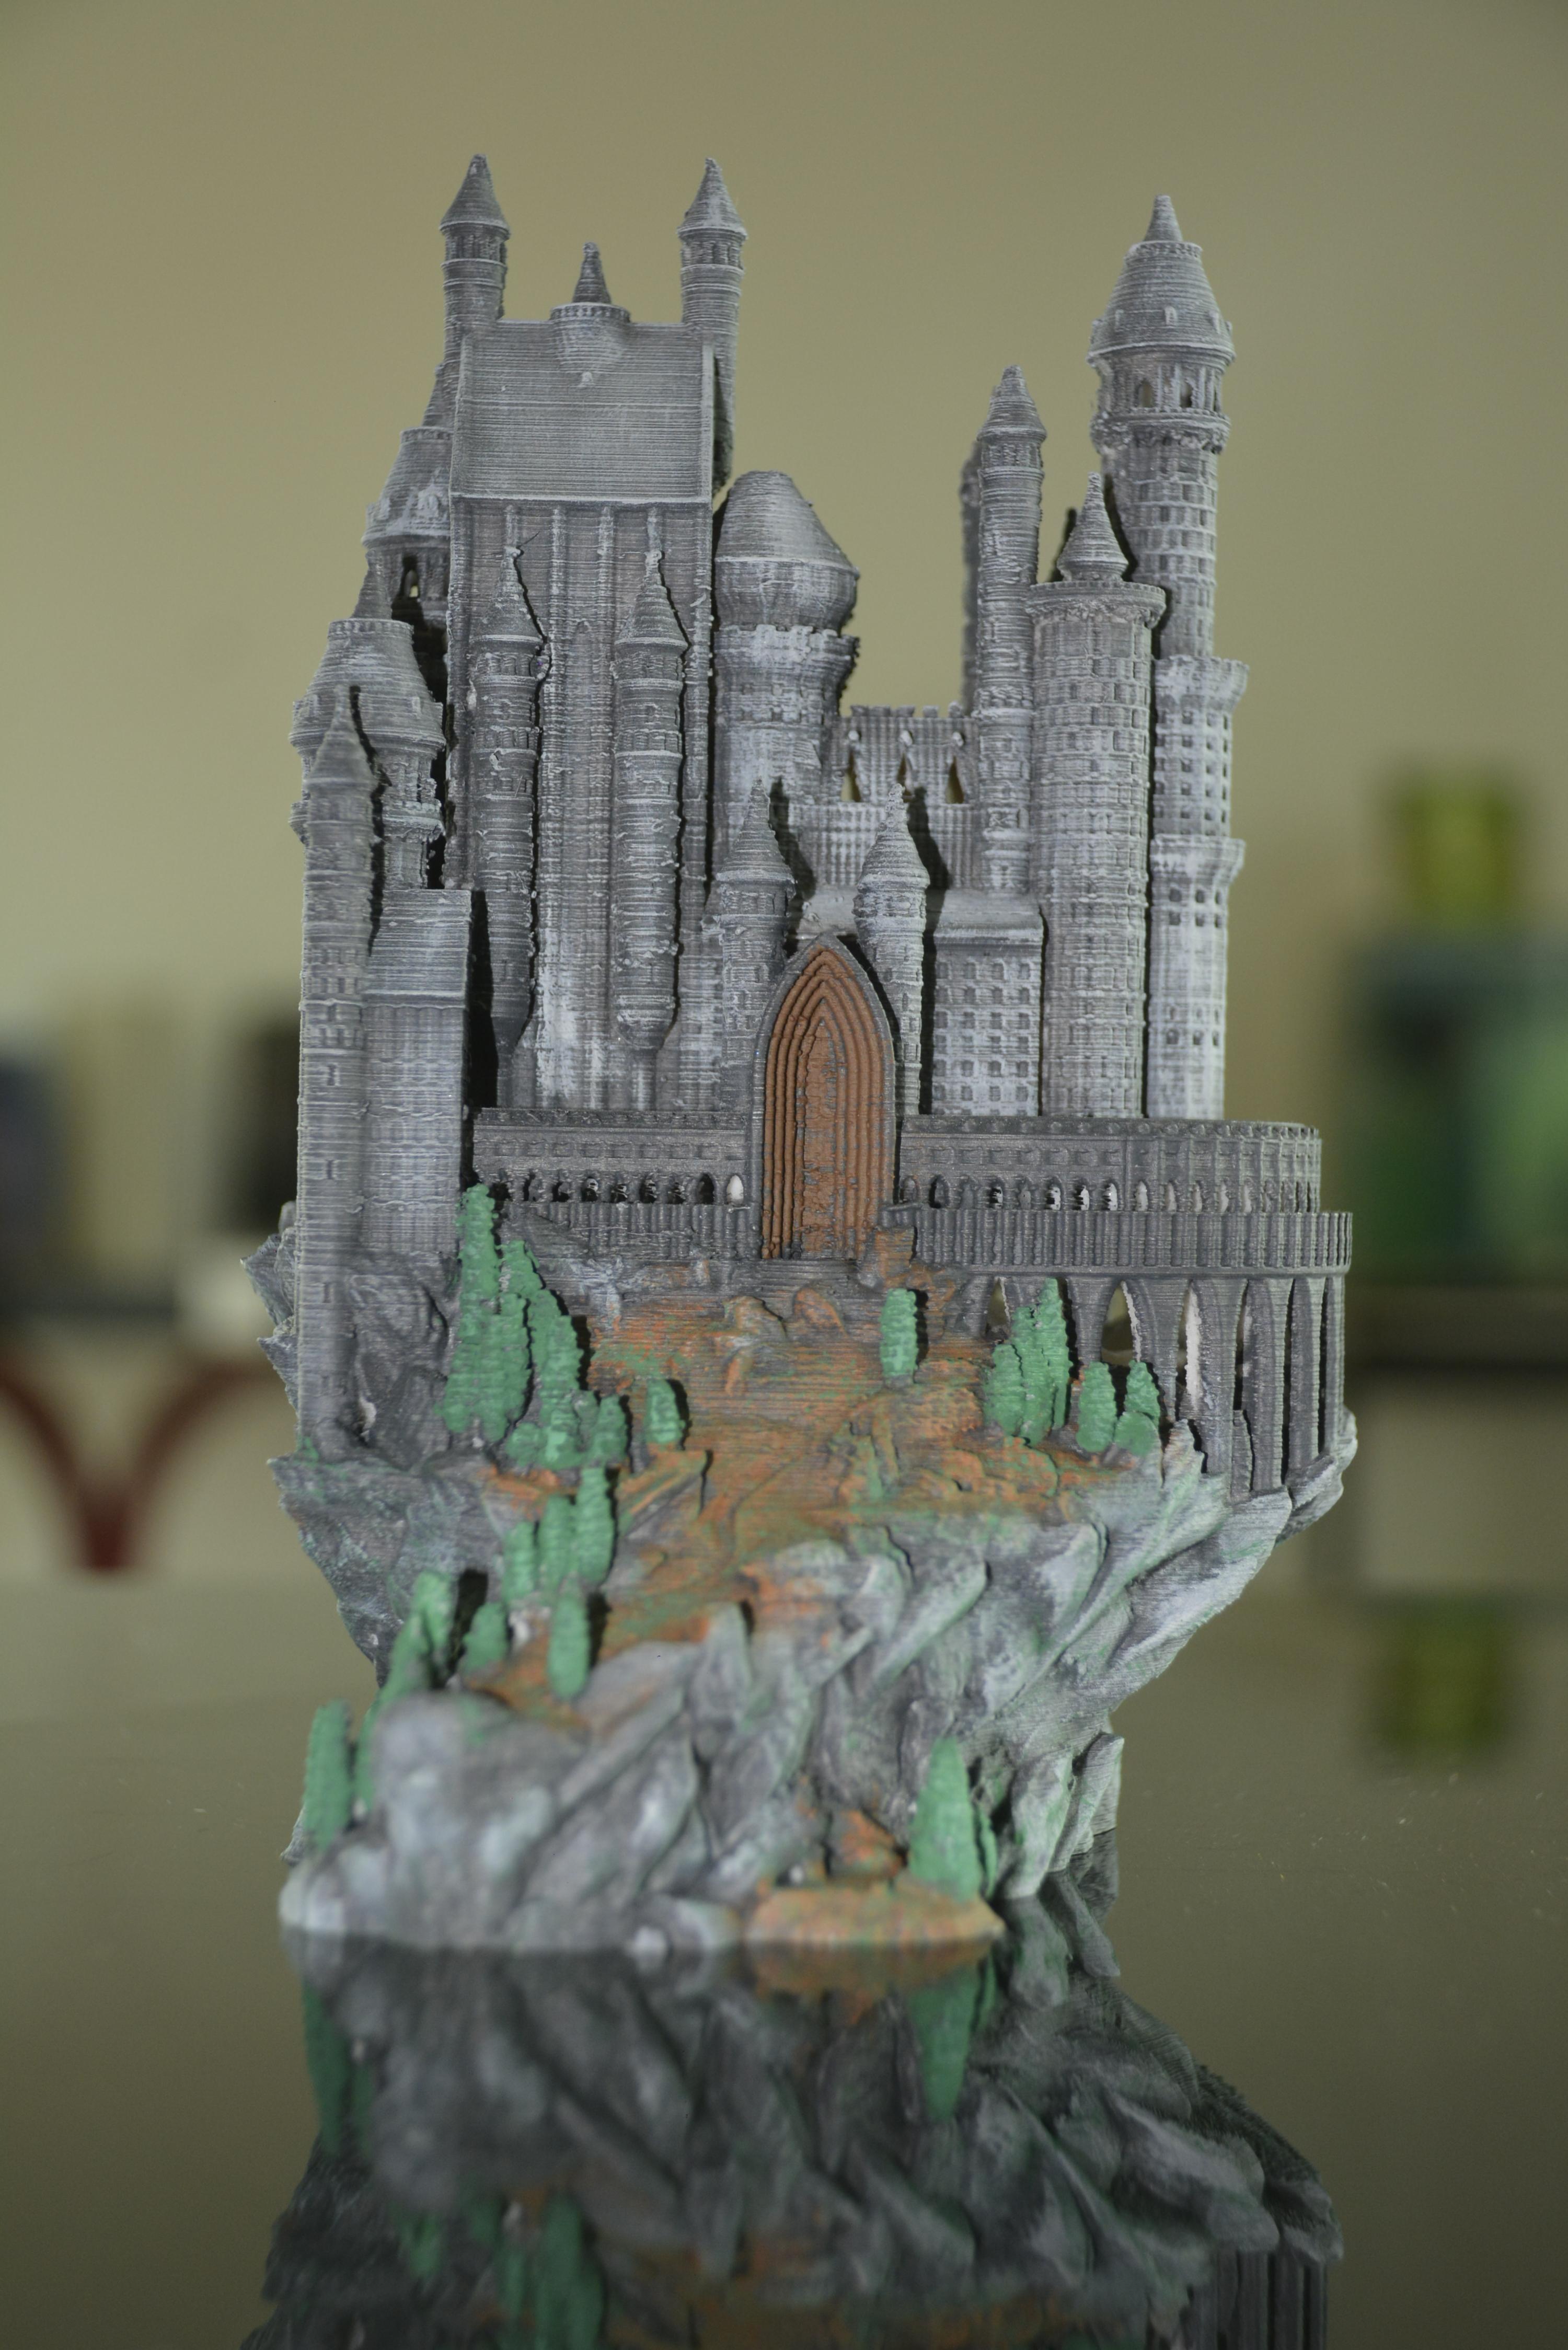 Castle printer with CreatorDuo